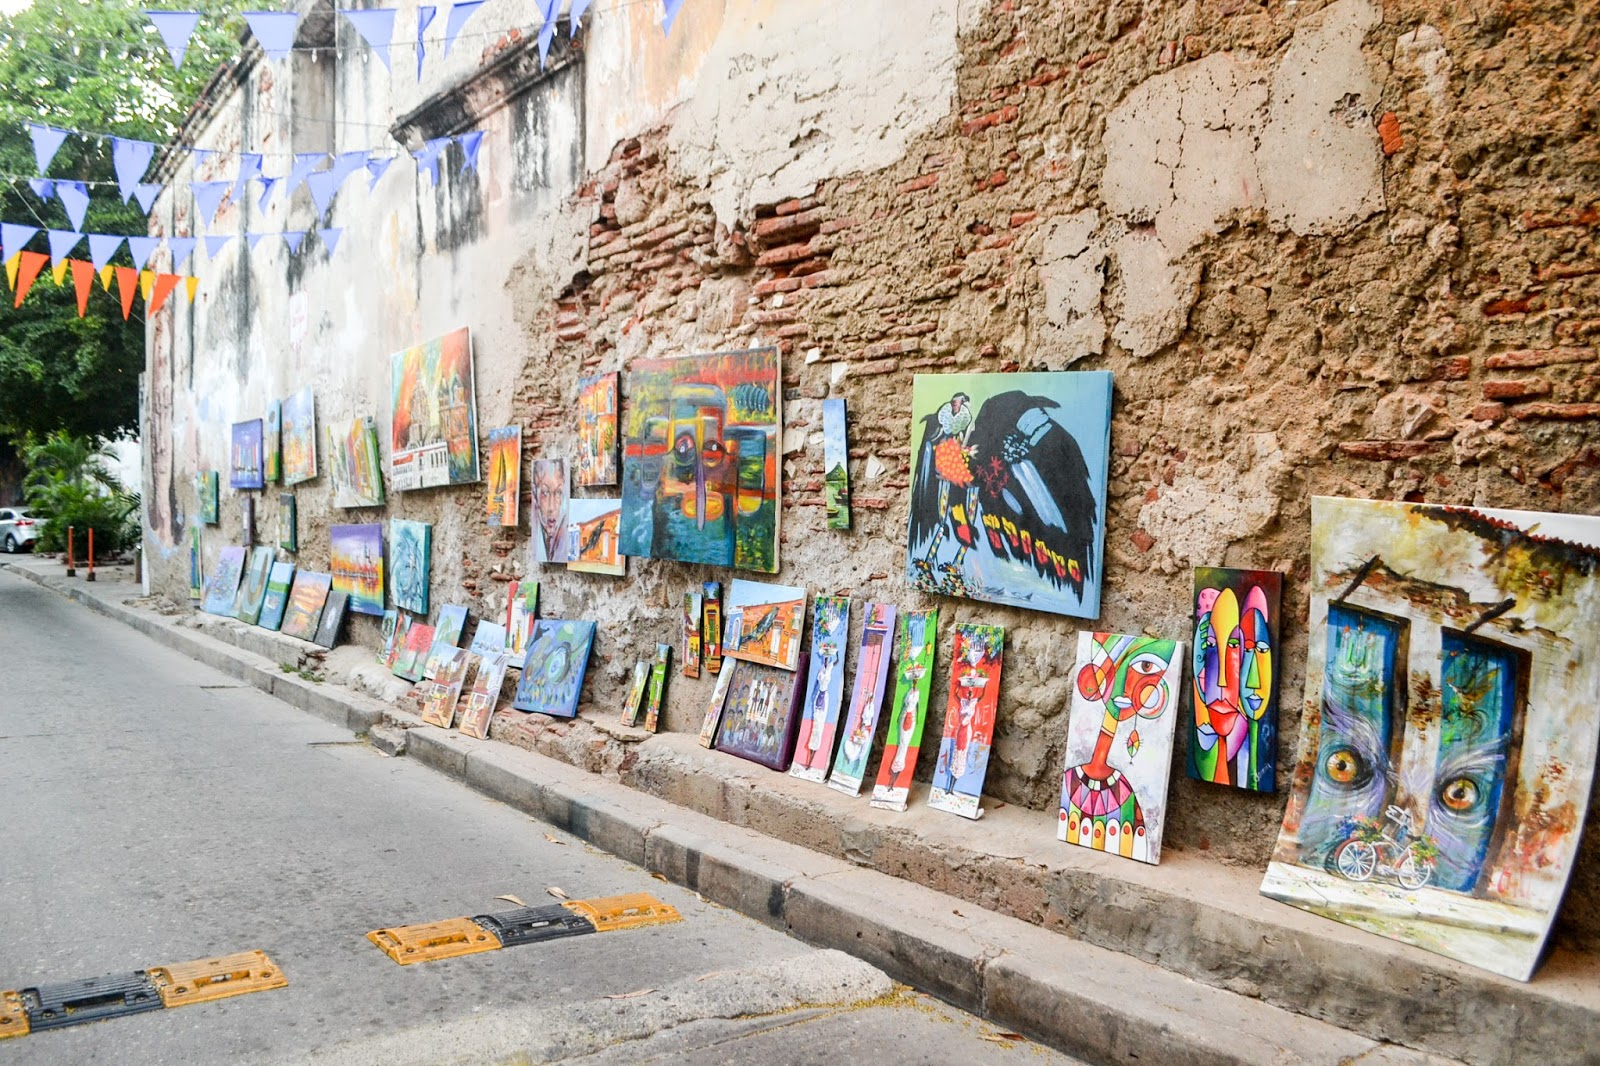 Cartagena, Colombia, ejnets.com